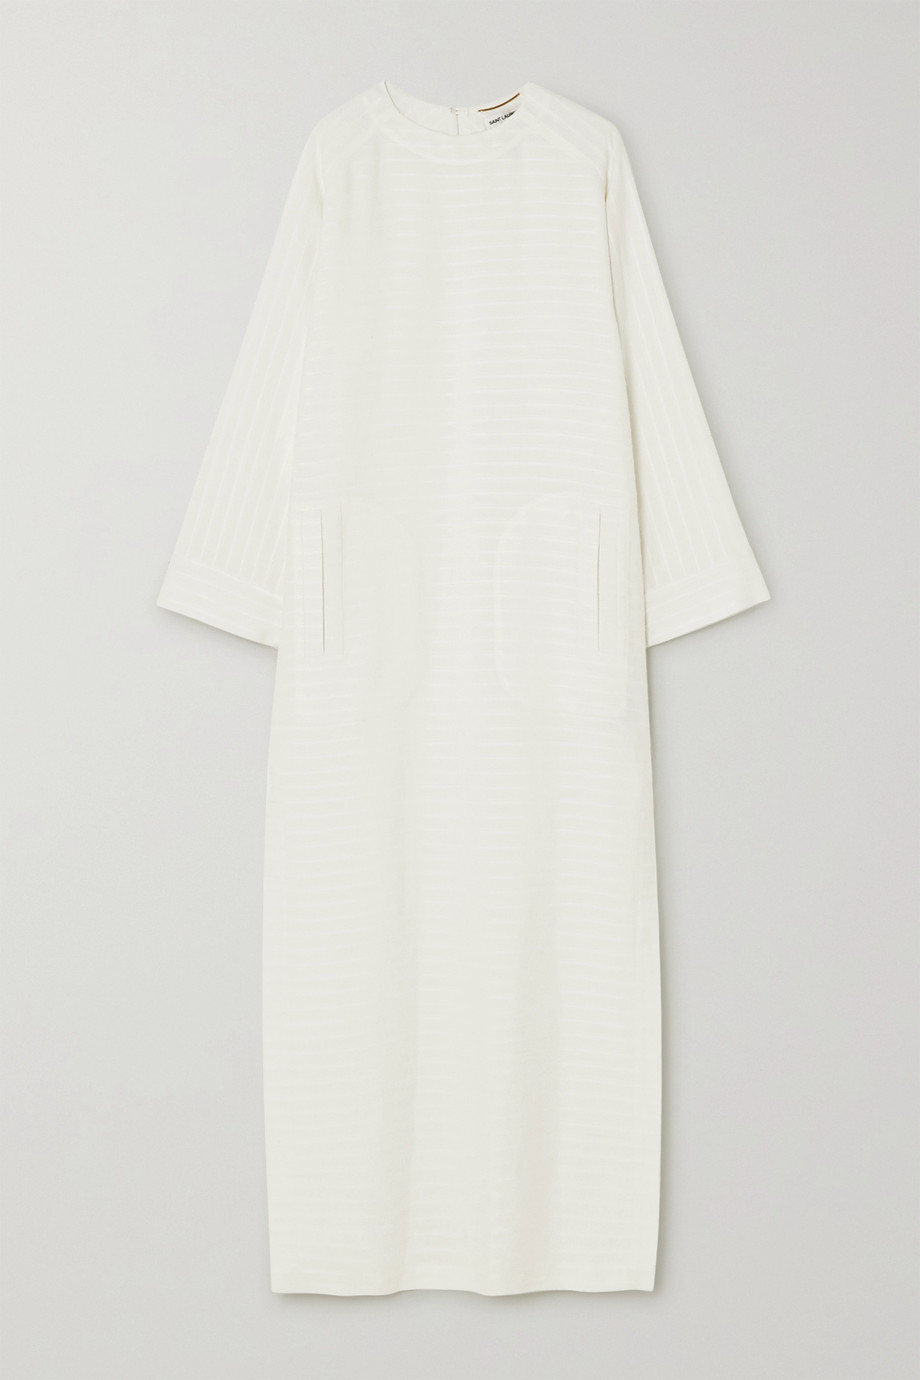 SAINT LAURENT Striped jacquard midi dress